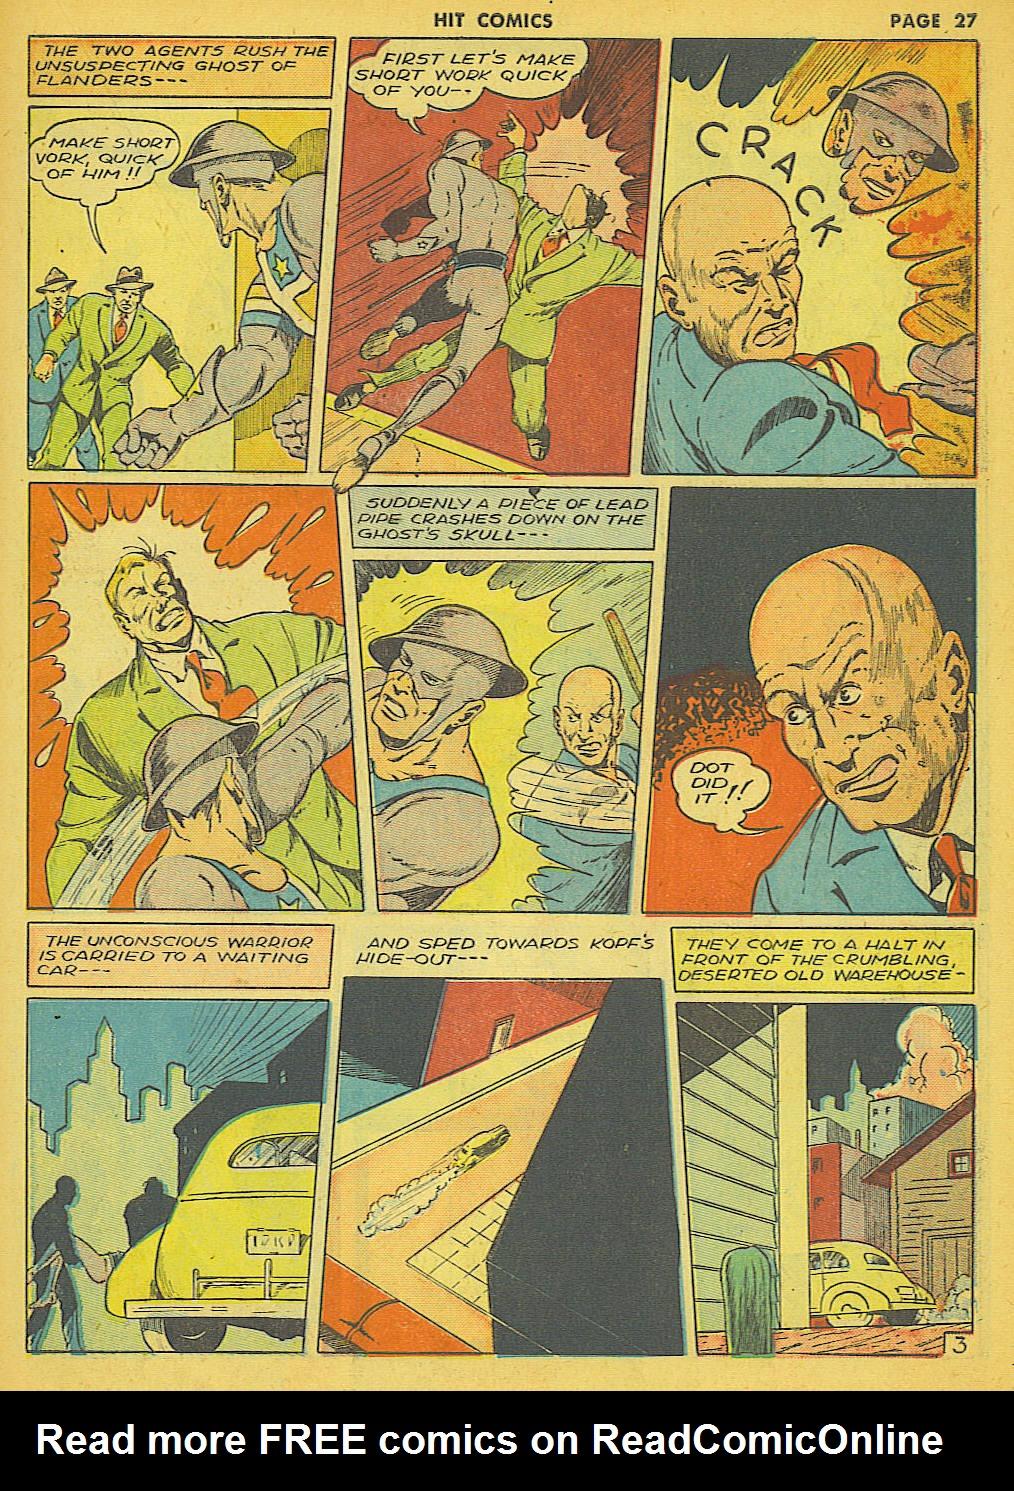 Read online Hit Comics comic -  Issue #21 - 29